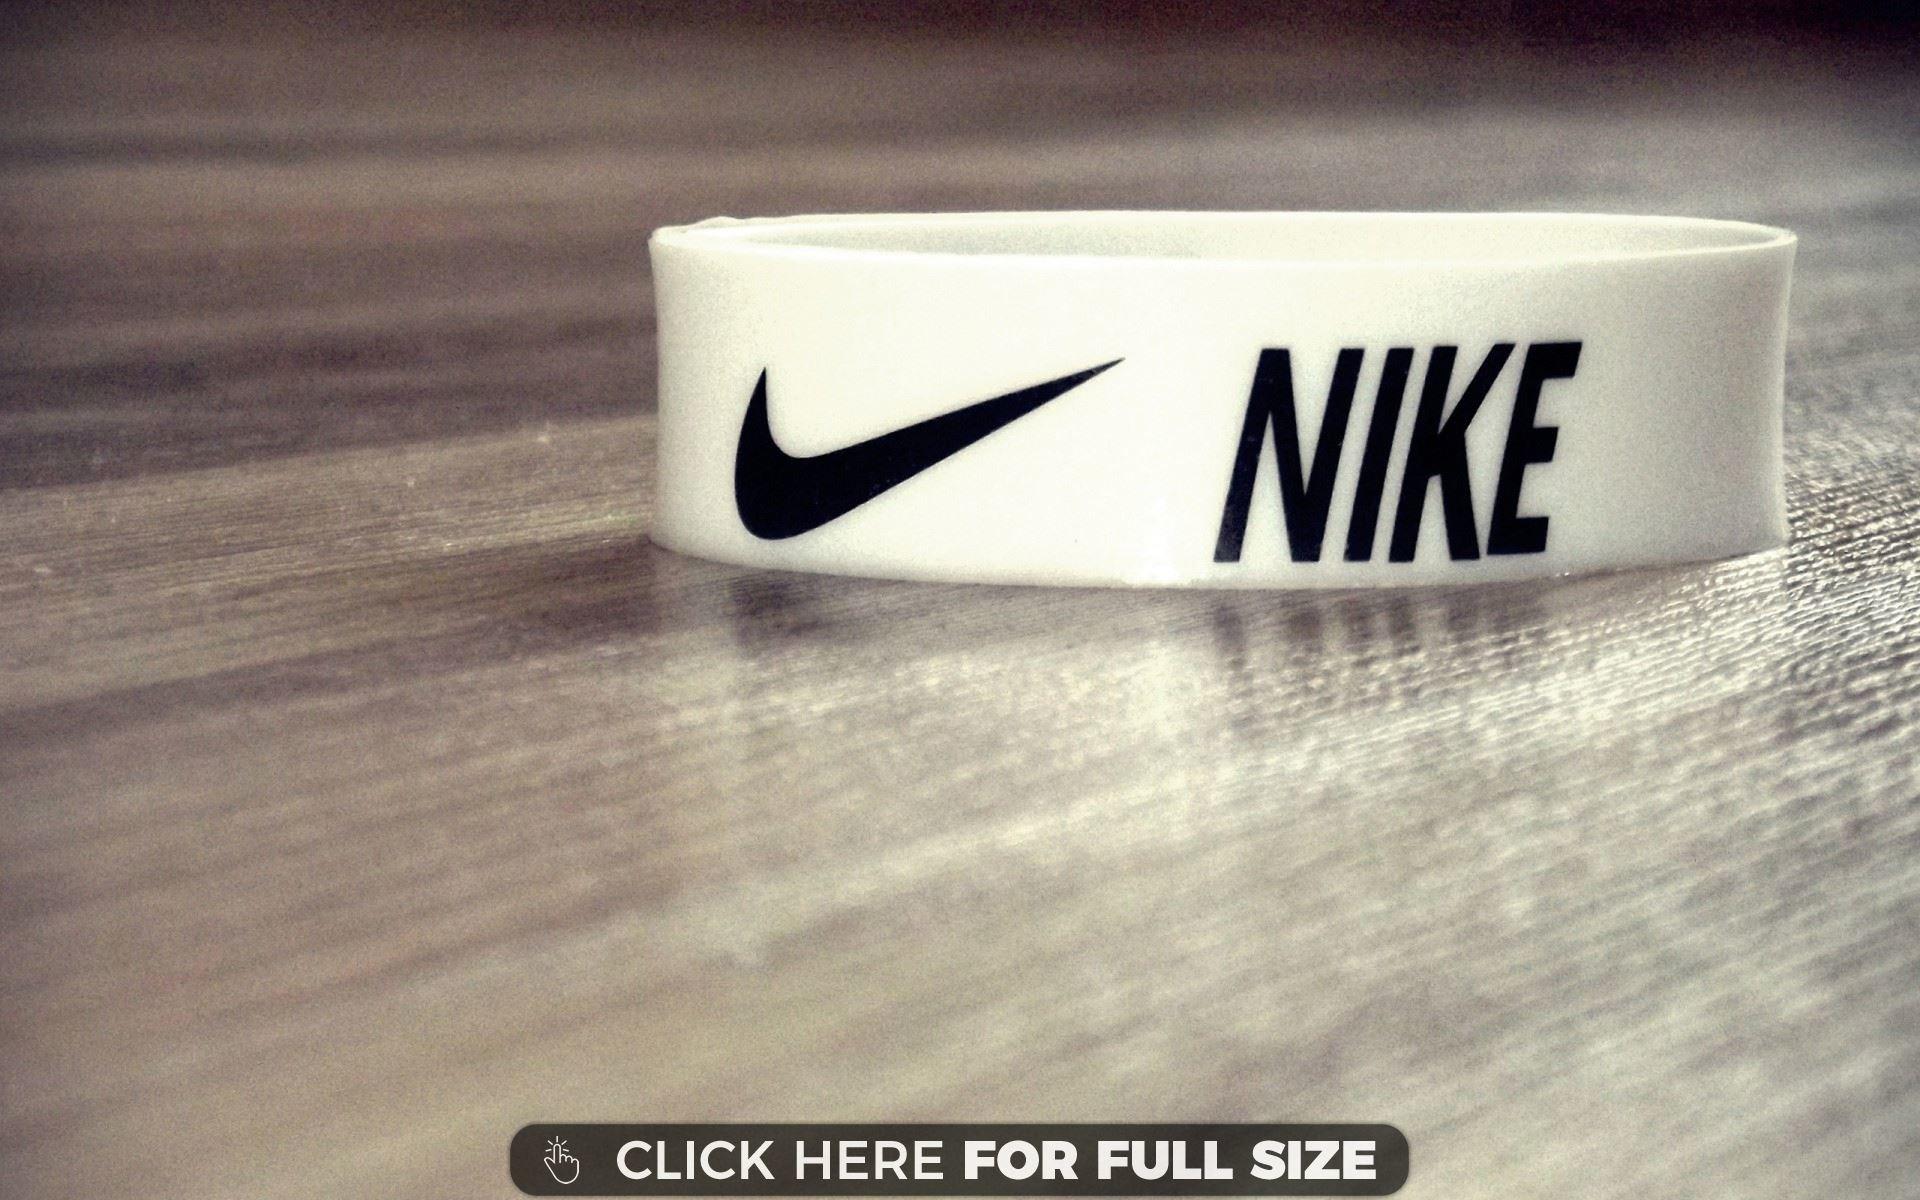 Nike Hd 4189 wallpaper